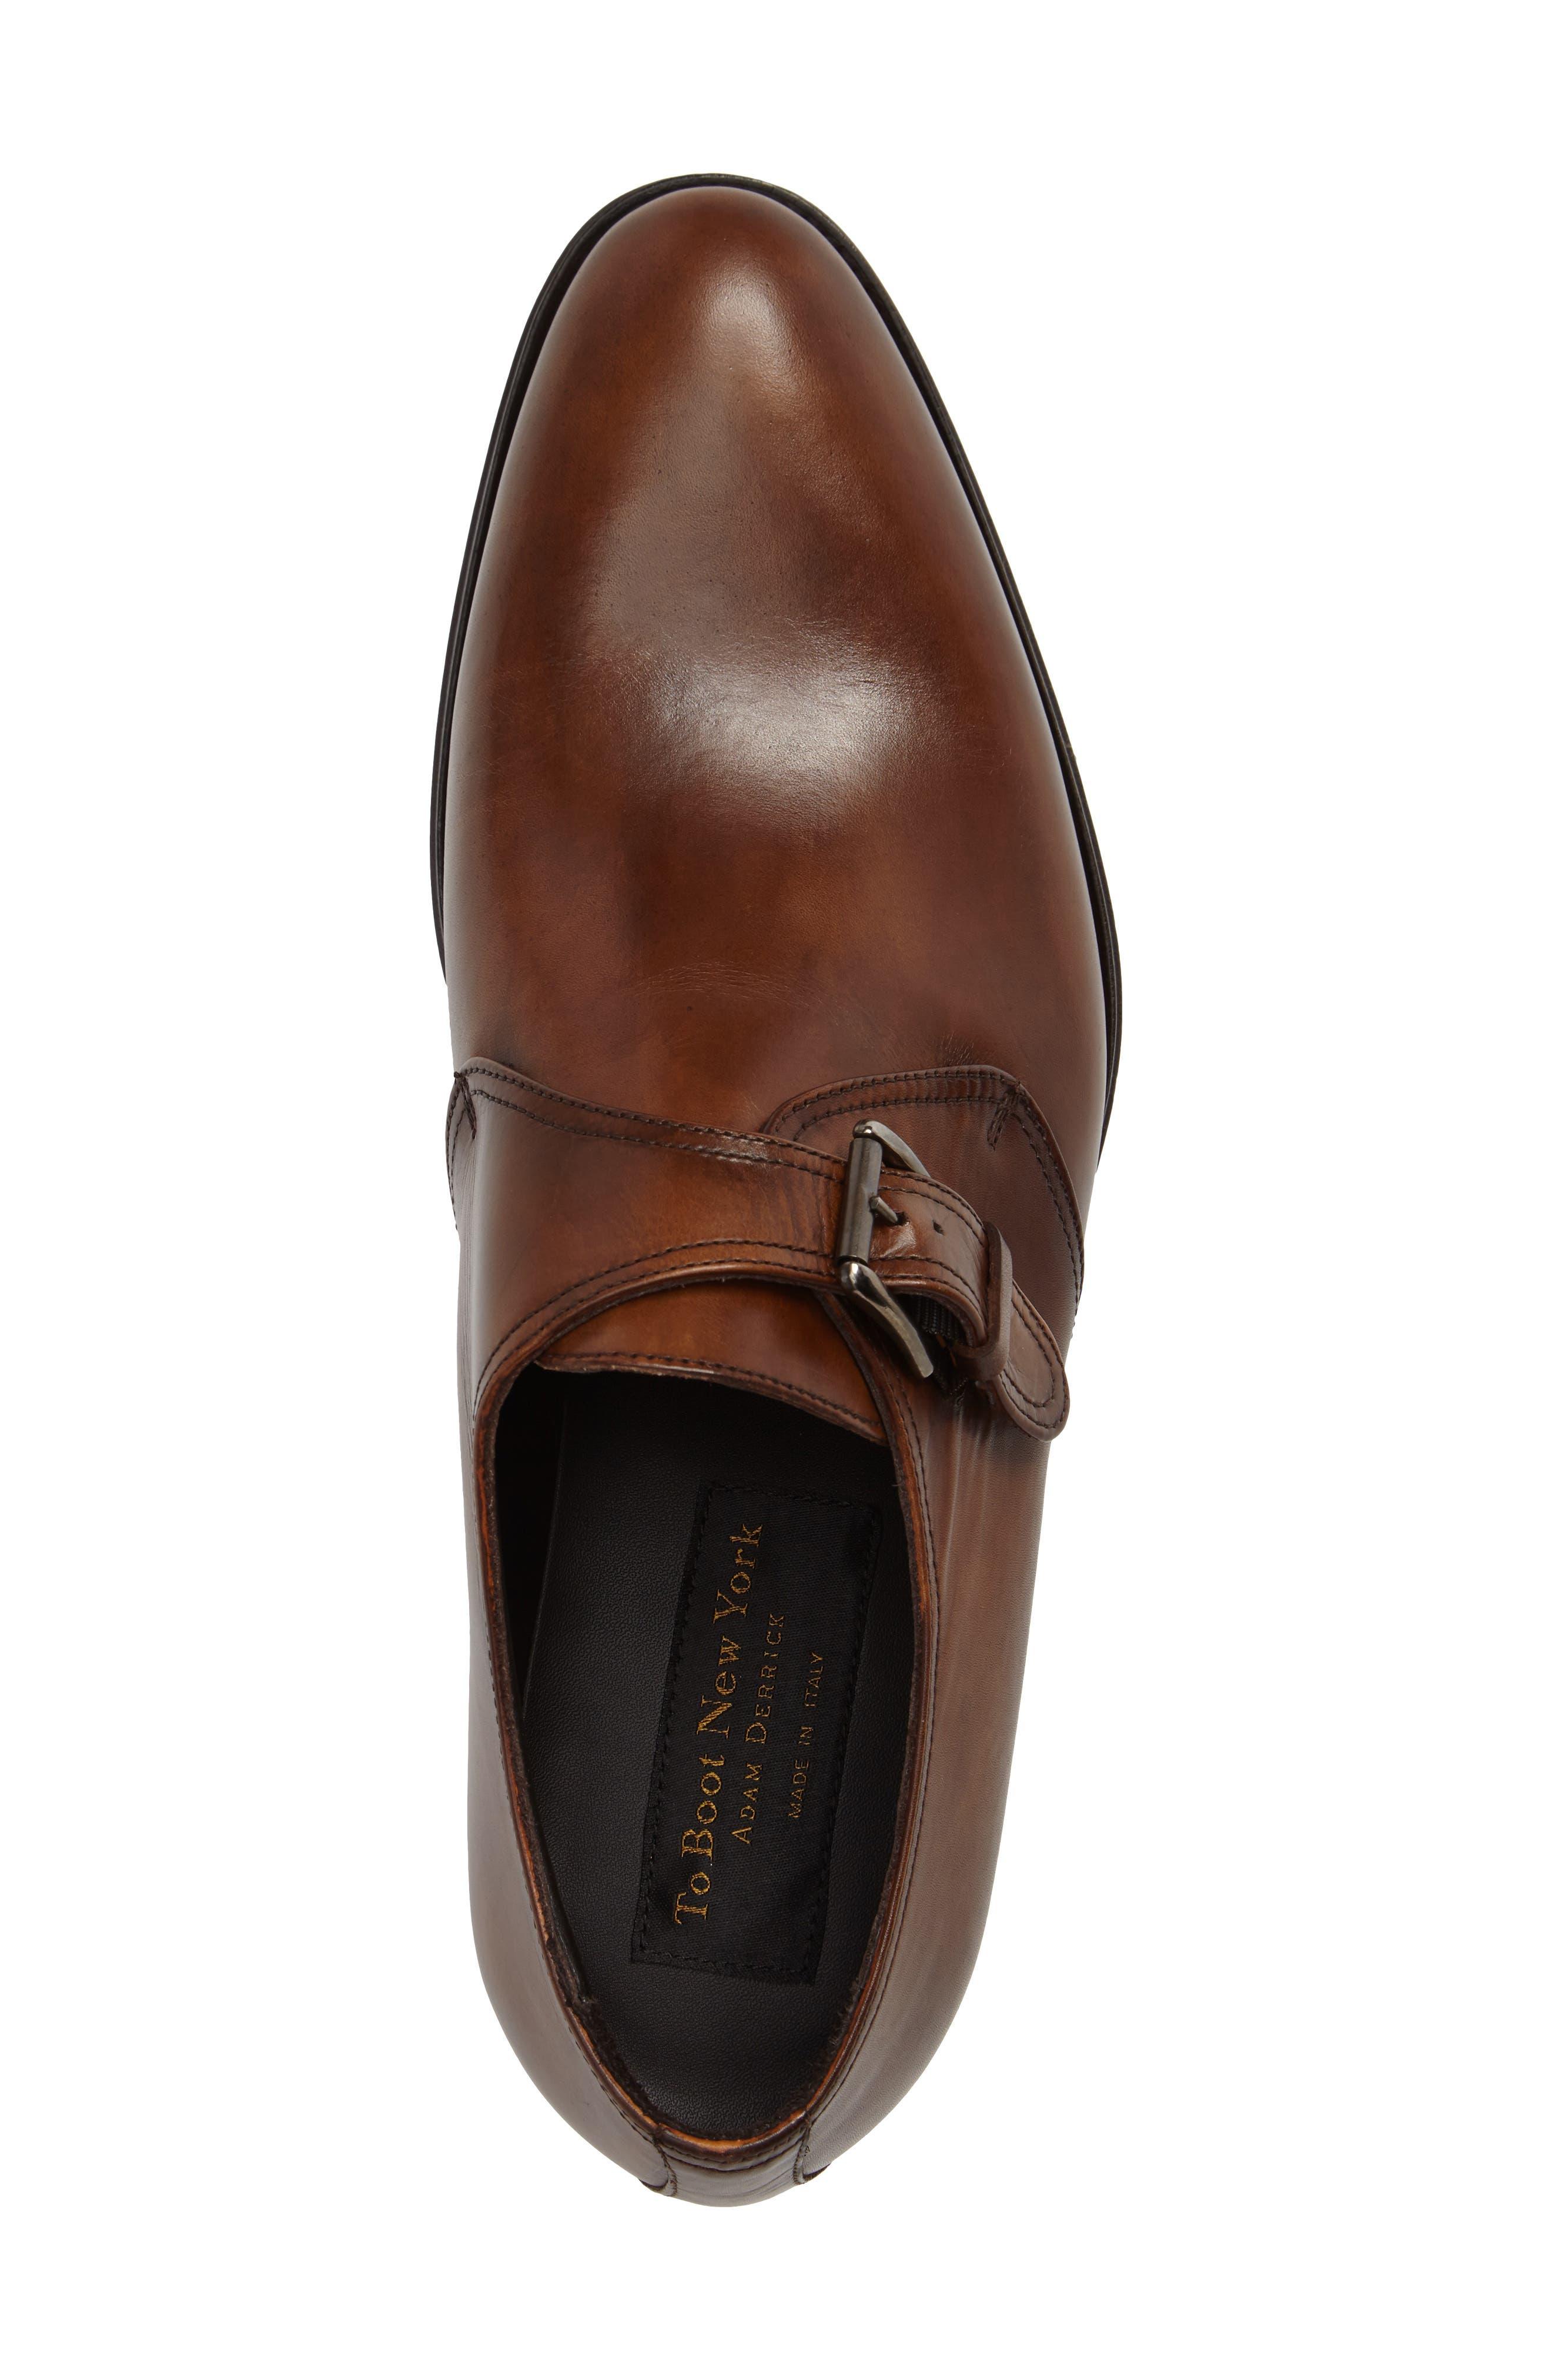 Emmett Monk Strap Shoe,                             Alternate thumbnail 23, color,